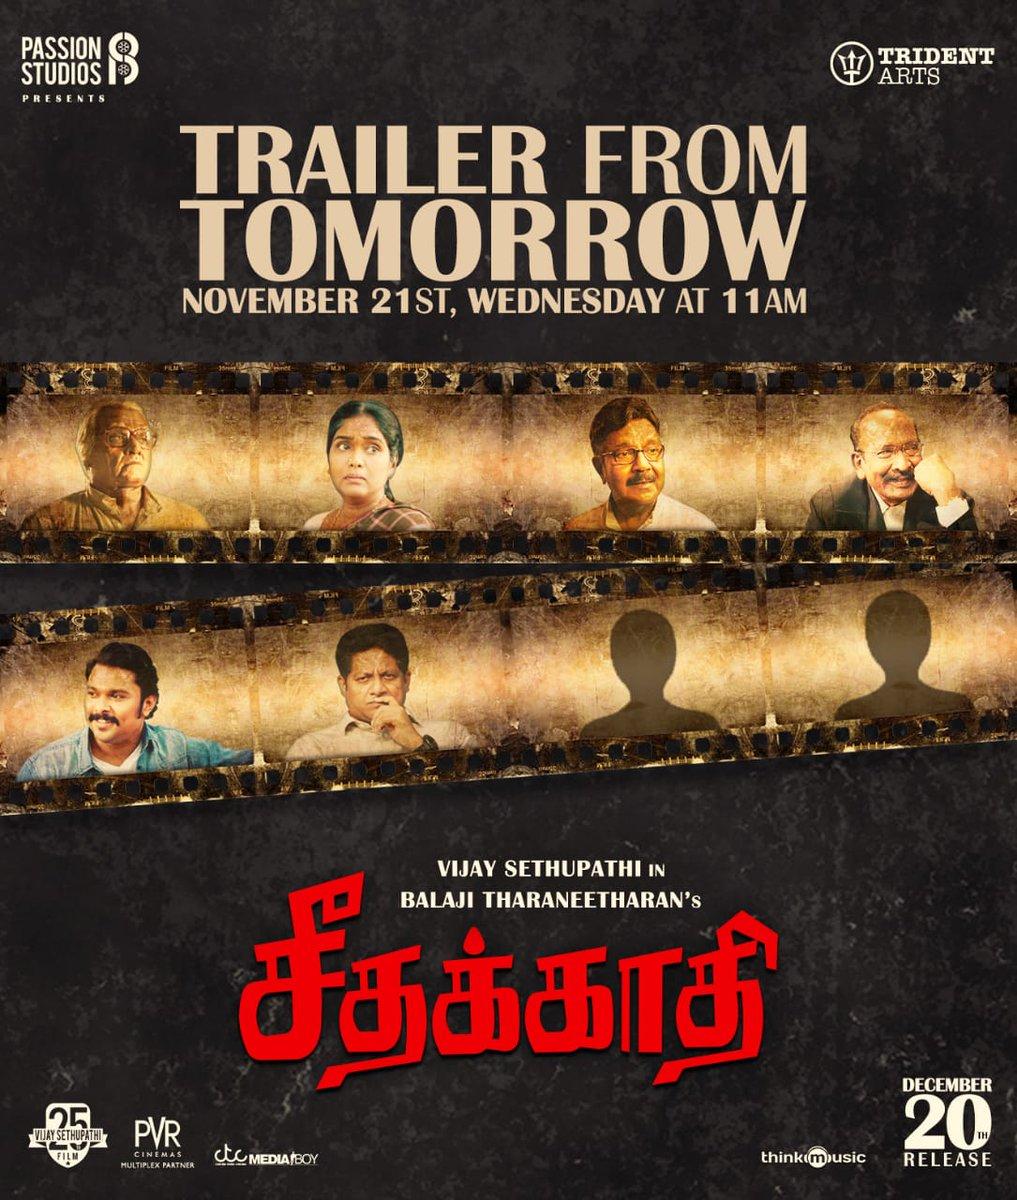 Seethakathi trailer treat from tomorrow poster